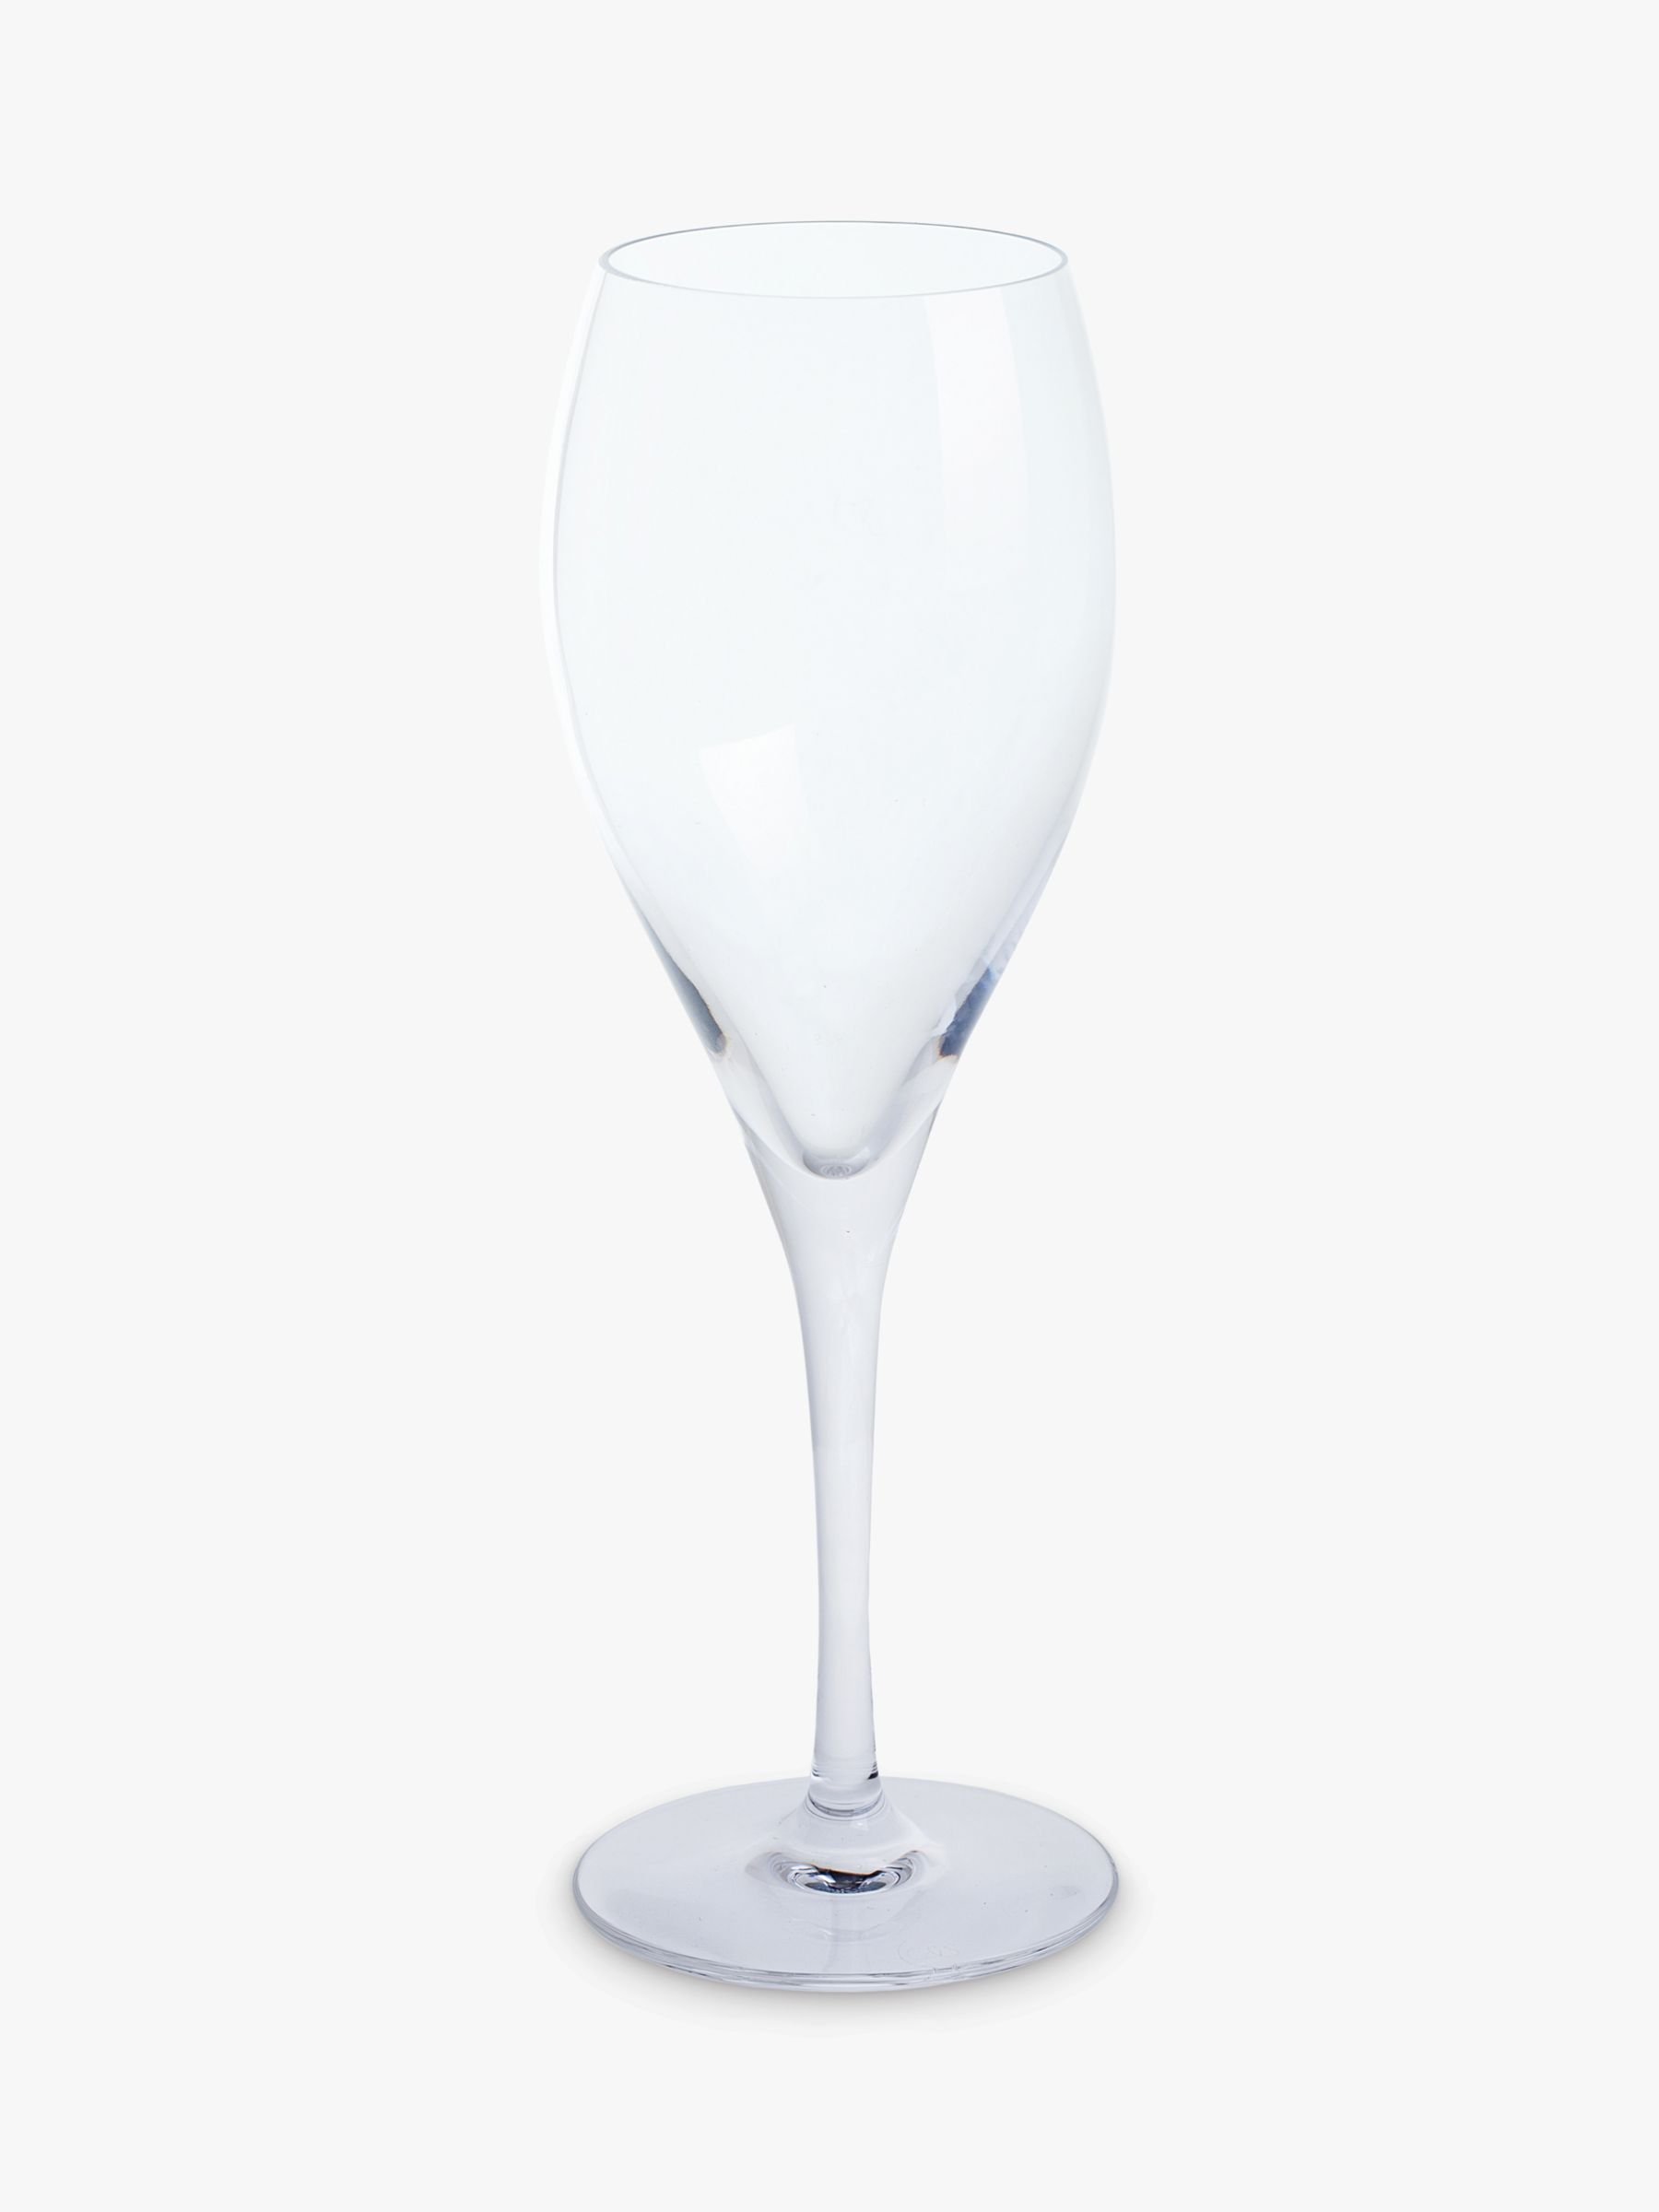 Dartington Crystal Dartington Crystal Prosecco Glass, Set of 6